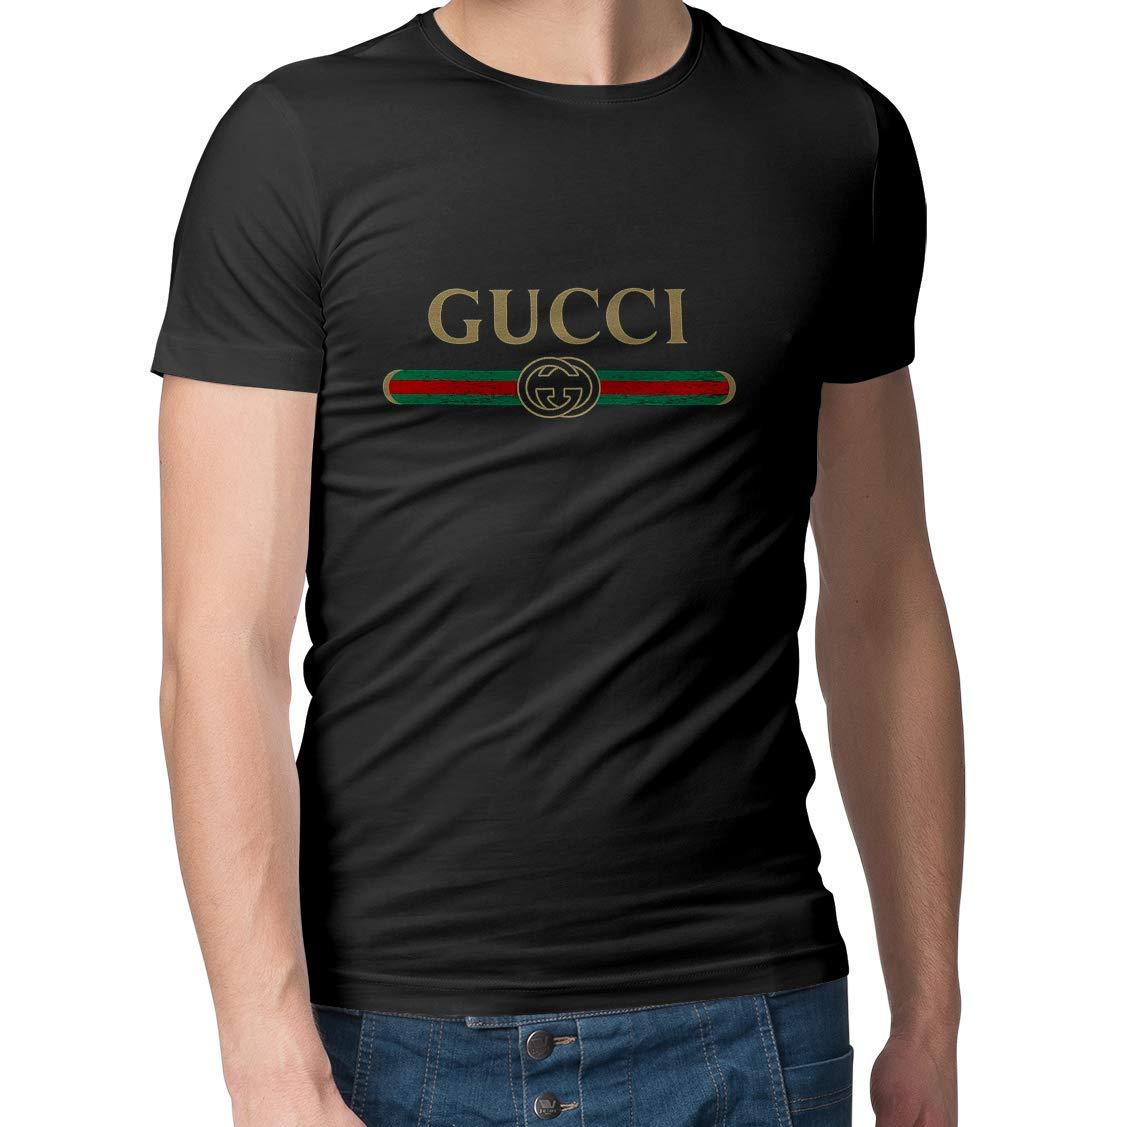 e59c6b42d Amazon.com: Fashion Gucci - Gucci Shirt Logo: Clothing